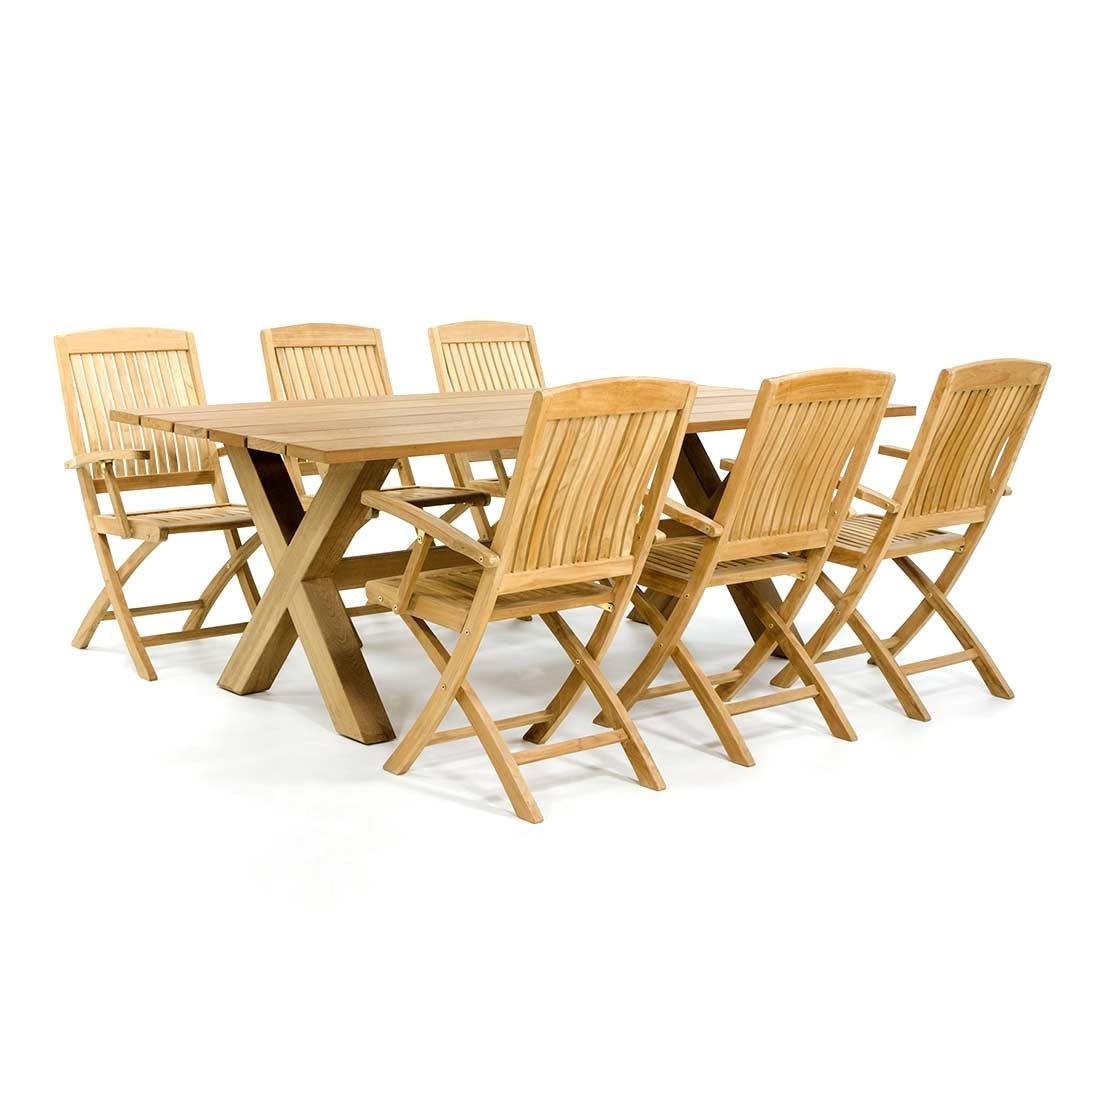 Kompletter Garten-Set aus Holz mit Kreuzfuß